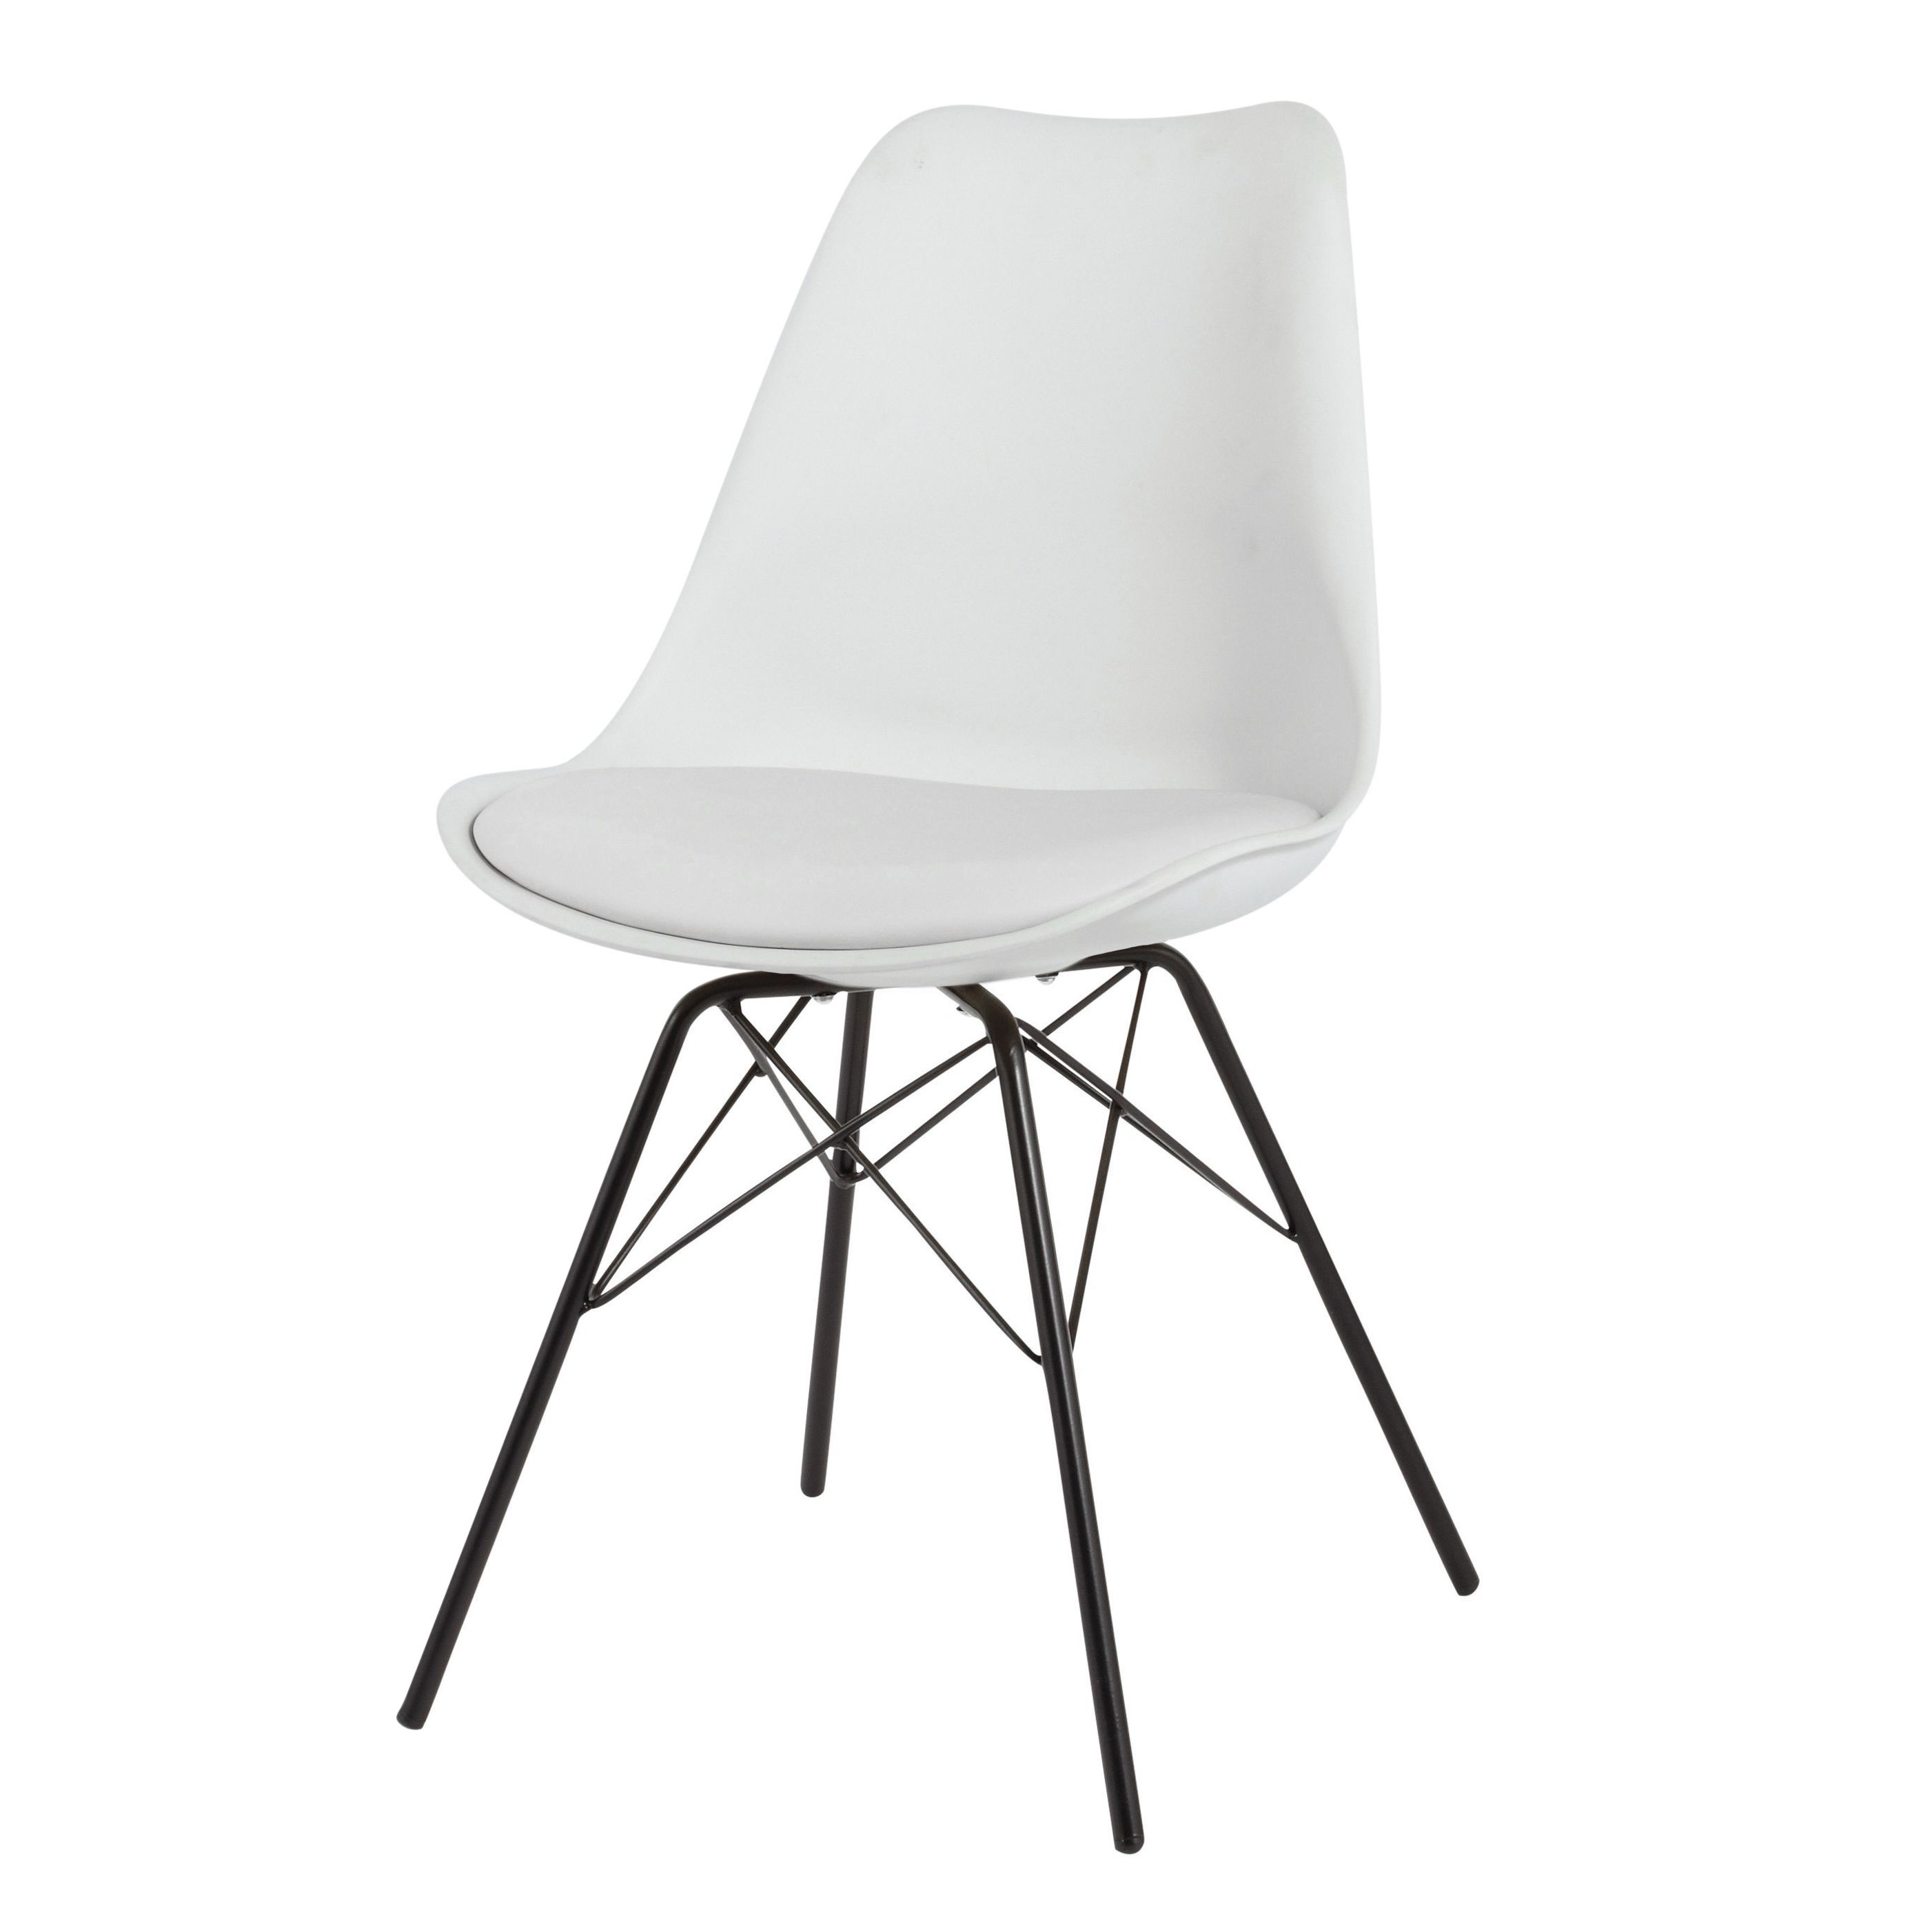 chaise blanche en polypropyl ne et m tal noir coventry